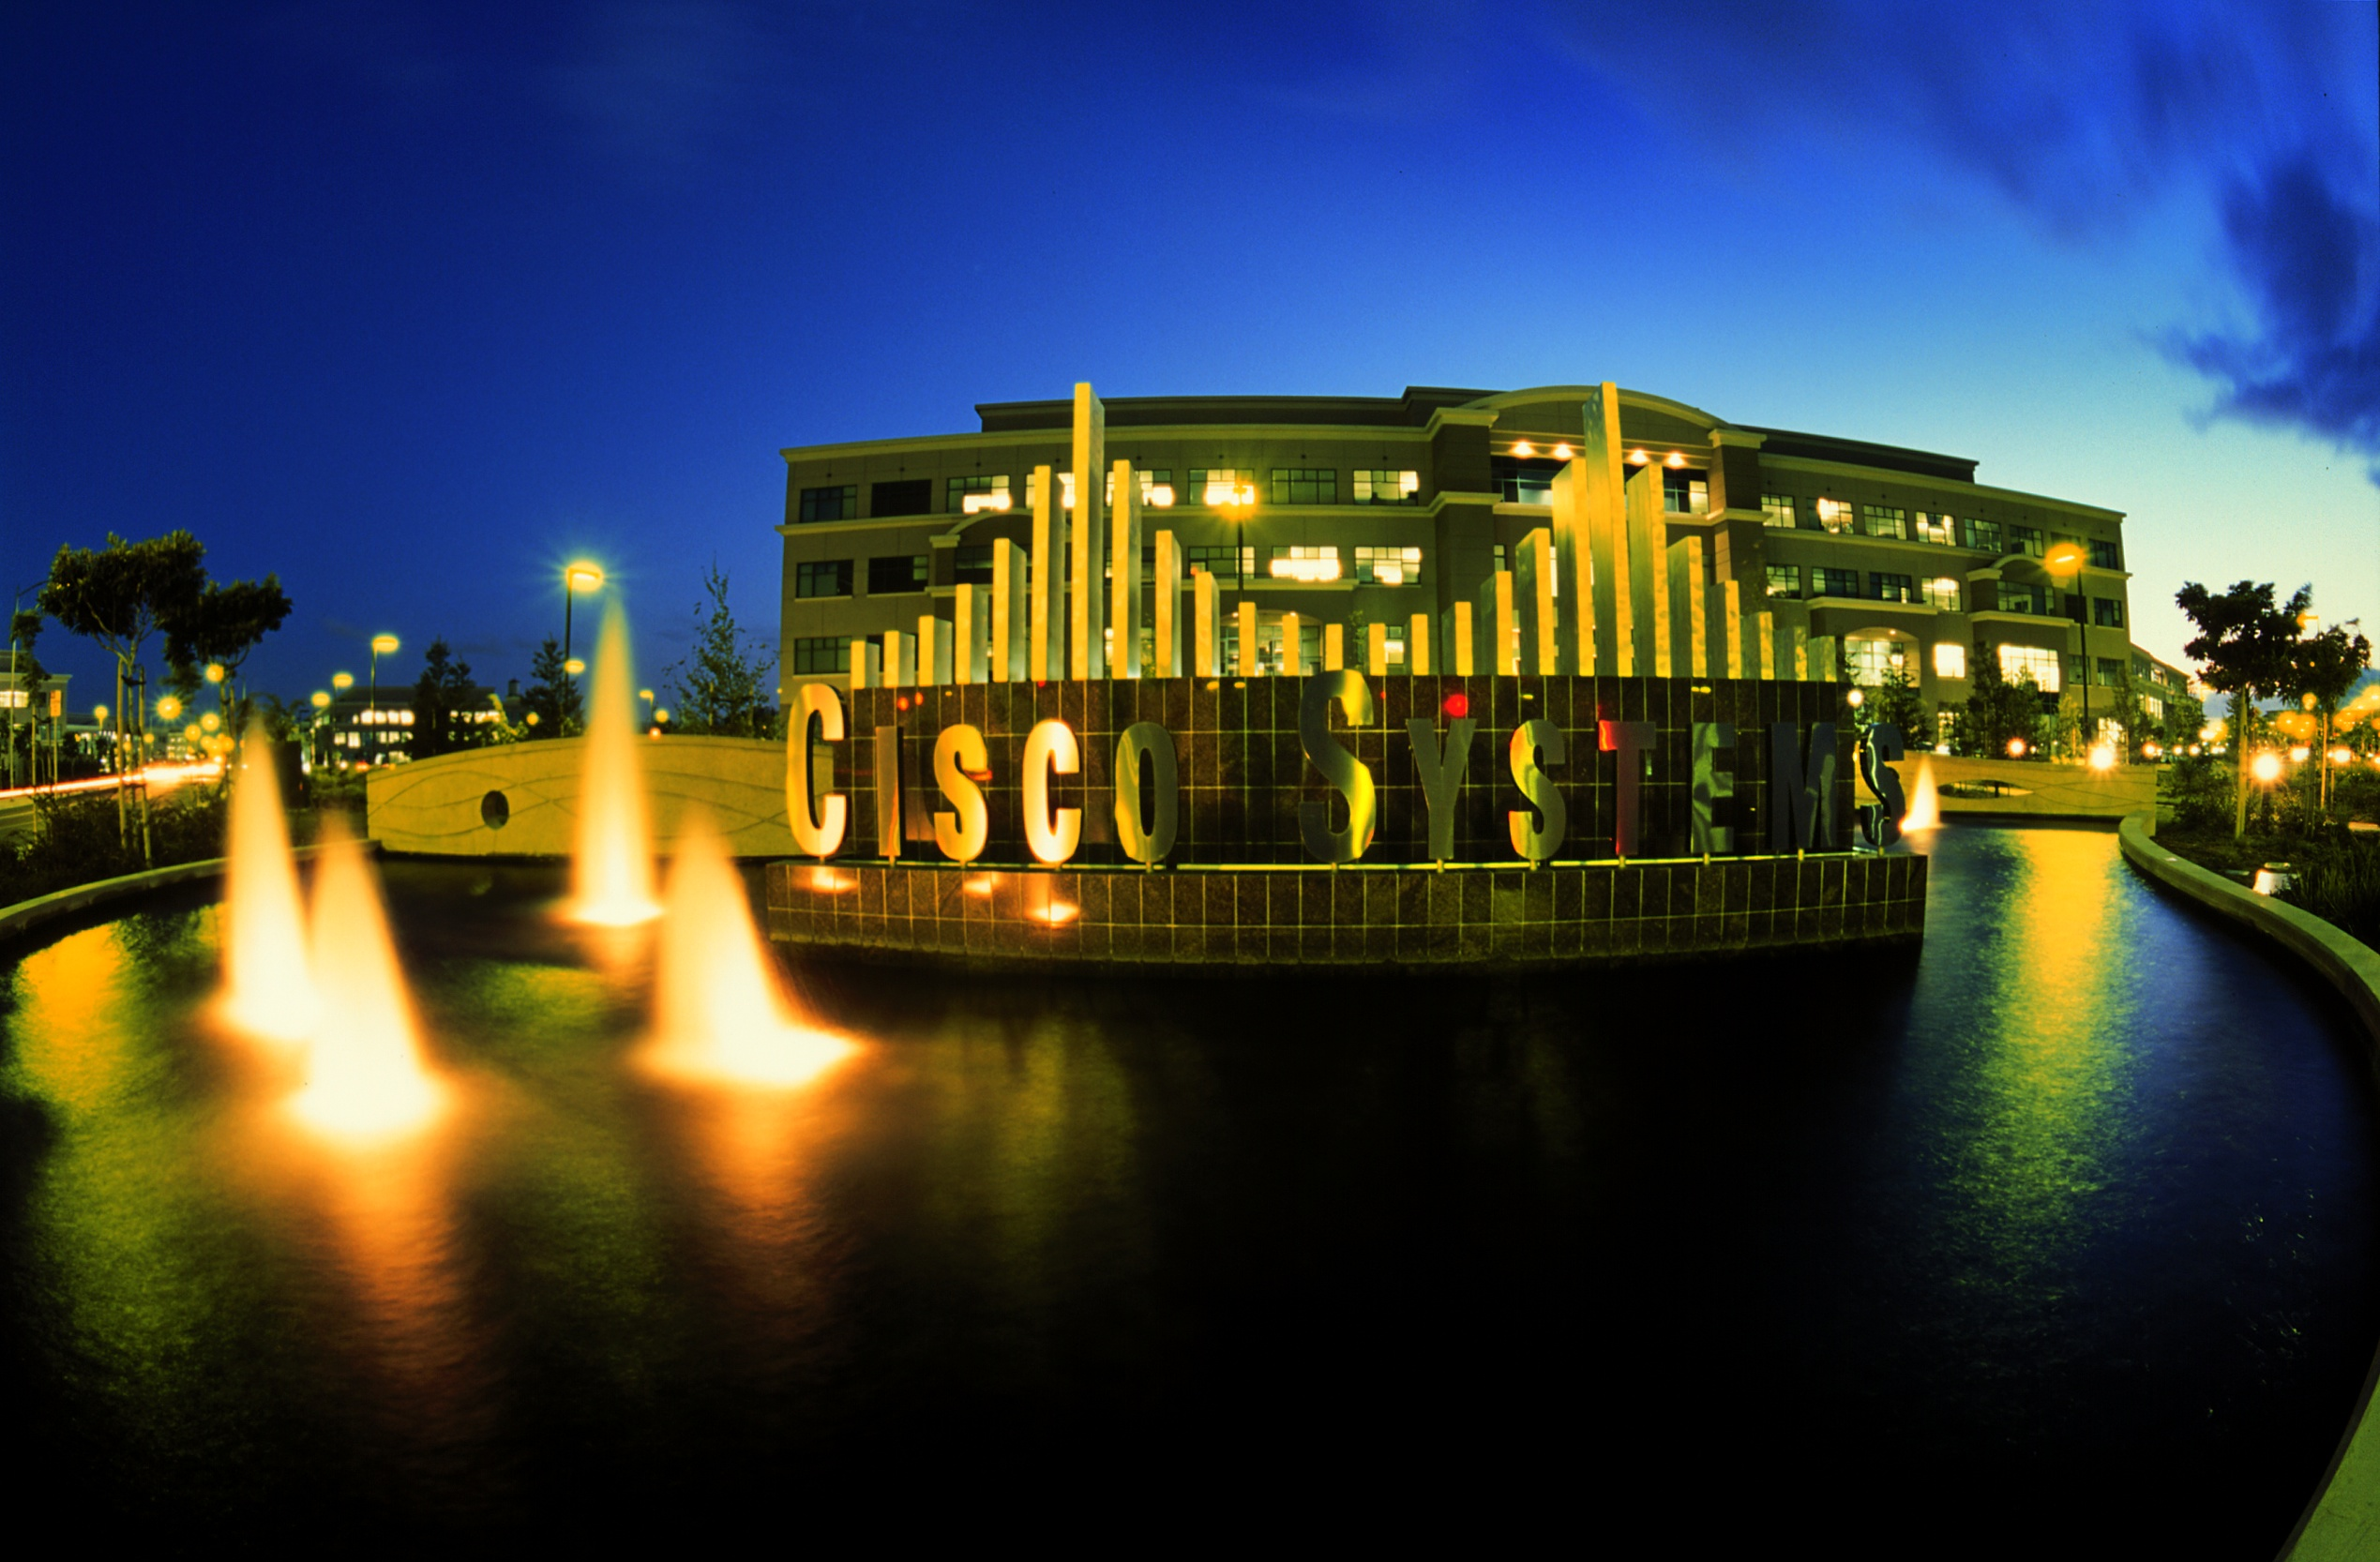 Siège social de Cisco Systems